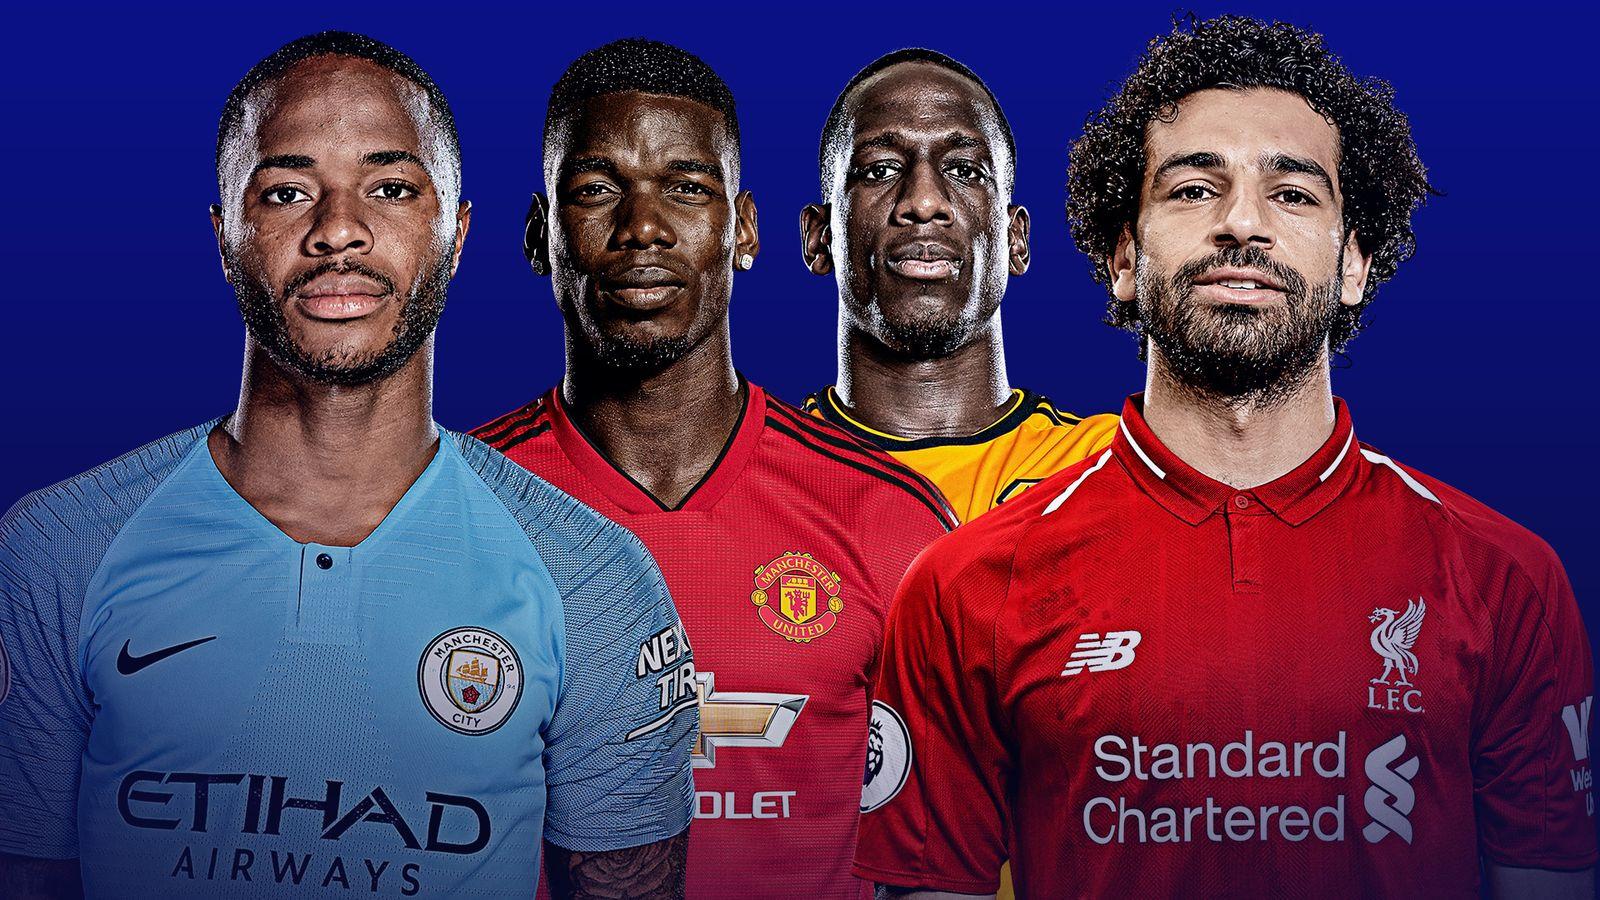 Premier League Xi Based On Sky Sports Power Rankings